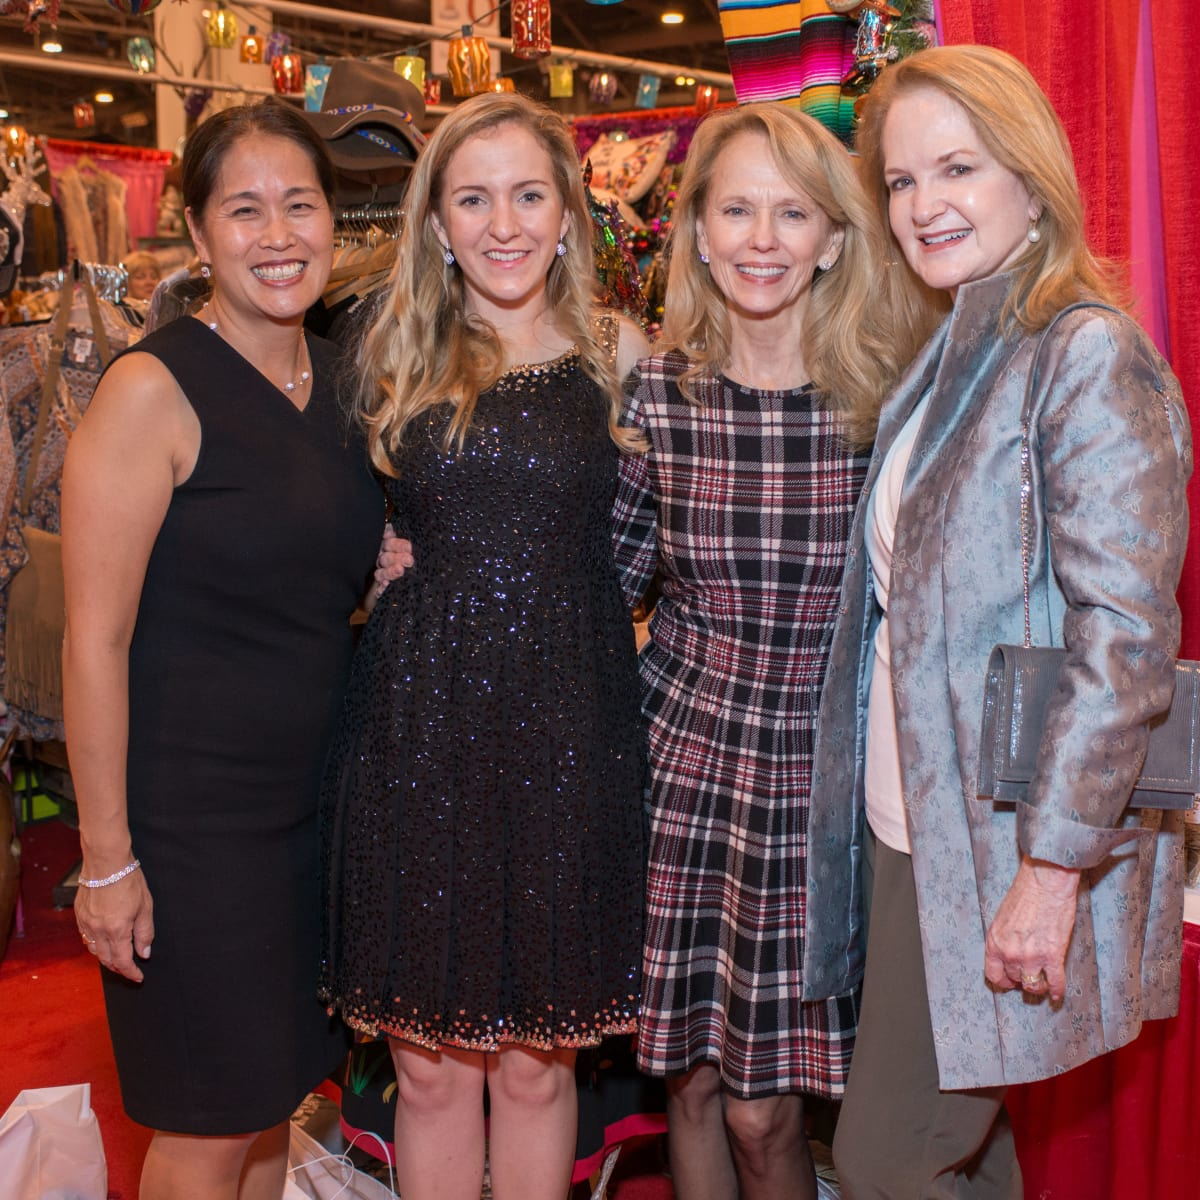 News, Shelby, Nutcracker Market, Nov. 2015, Grace Kim, Kelly Krohn, Susan Sarofim, Sandy Barrett